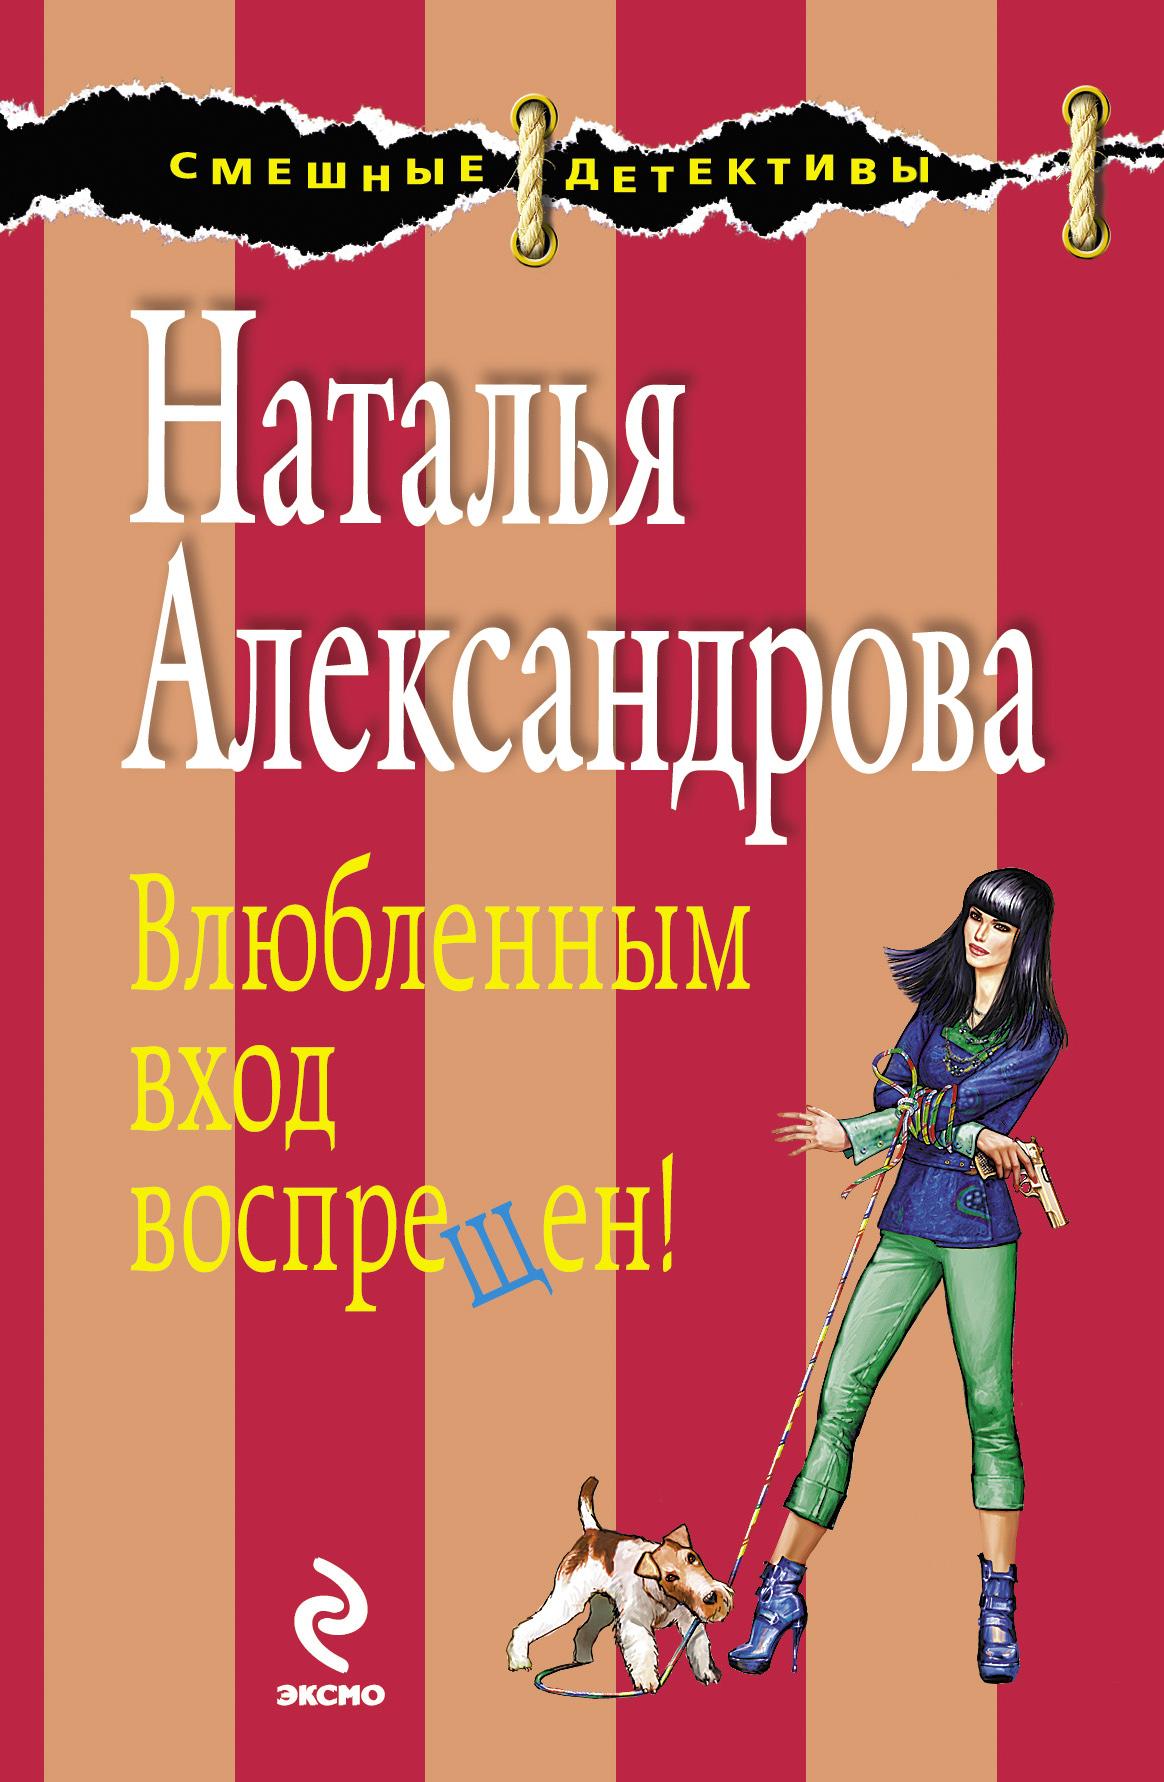 Наталья Александроа любленным ход оспрещен!